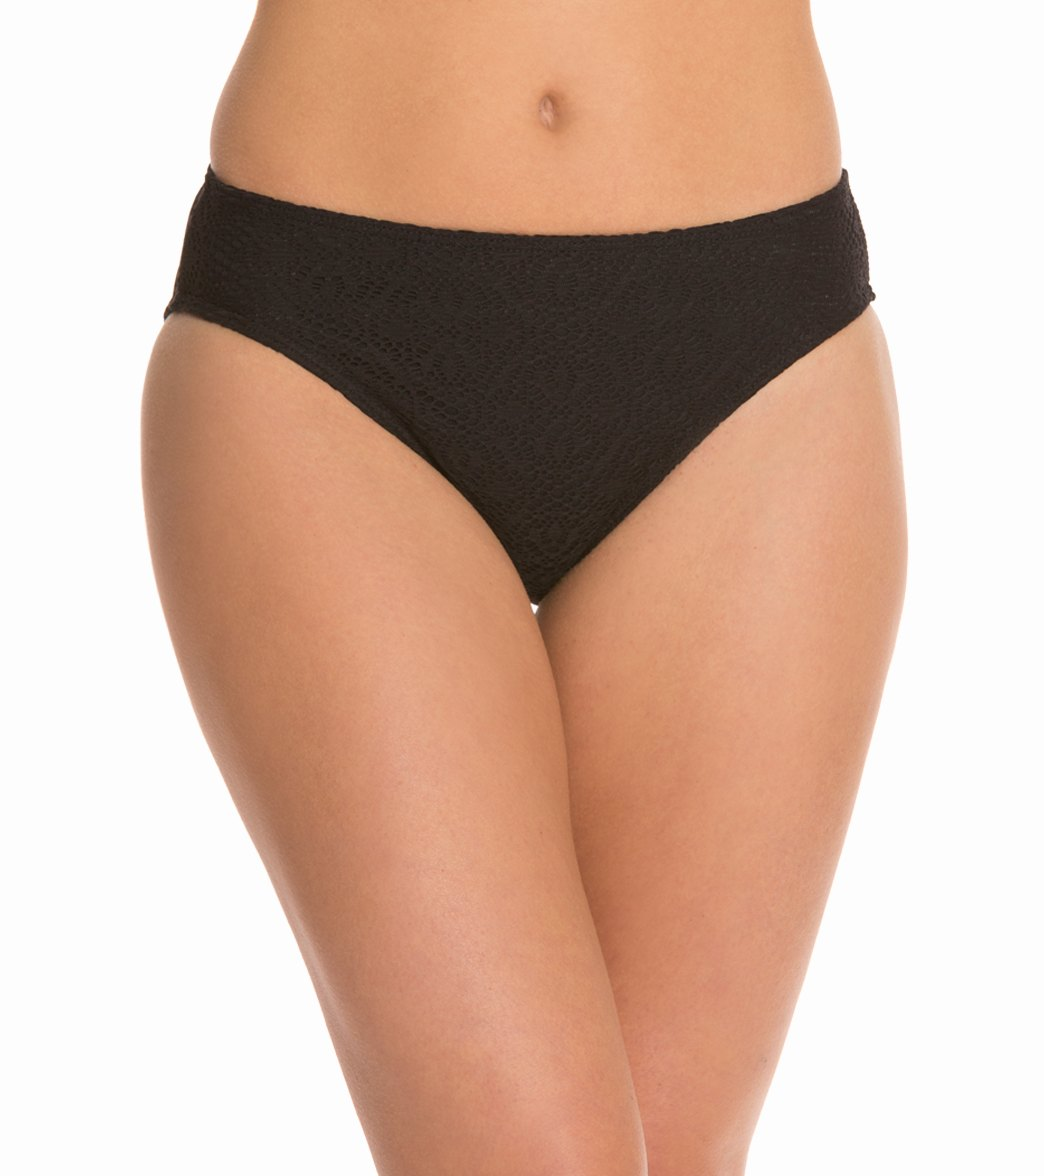 a1eae22c77e95 Sunsets Swimwear Black Sand Crochet Mid-Rise Bikini Bottom at  SwimOutlet.com - Free Shipping